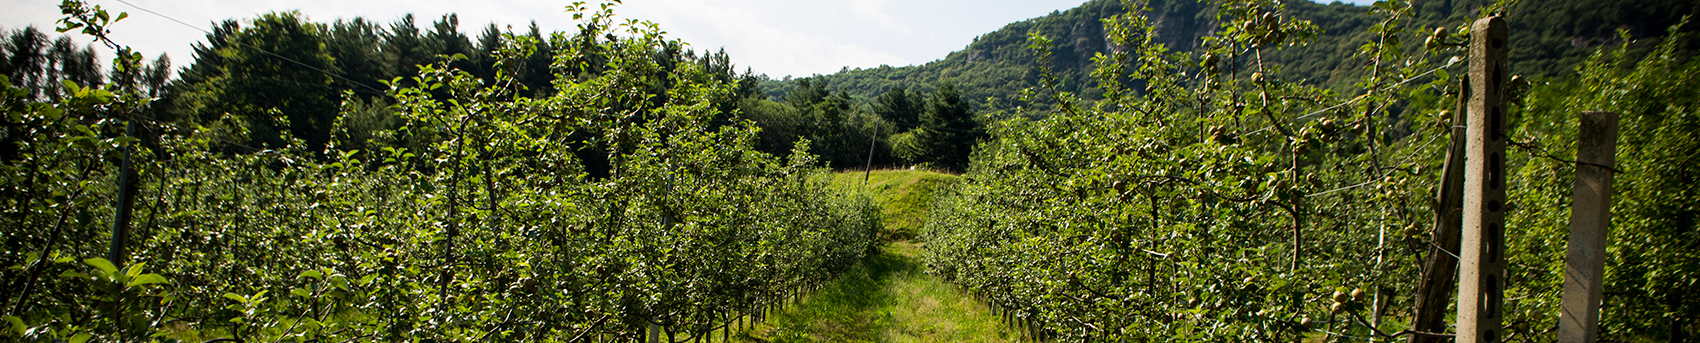 azienza-agricola-bargiolina-2